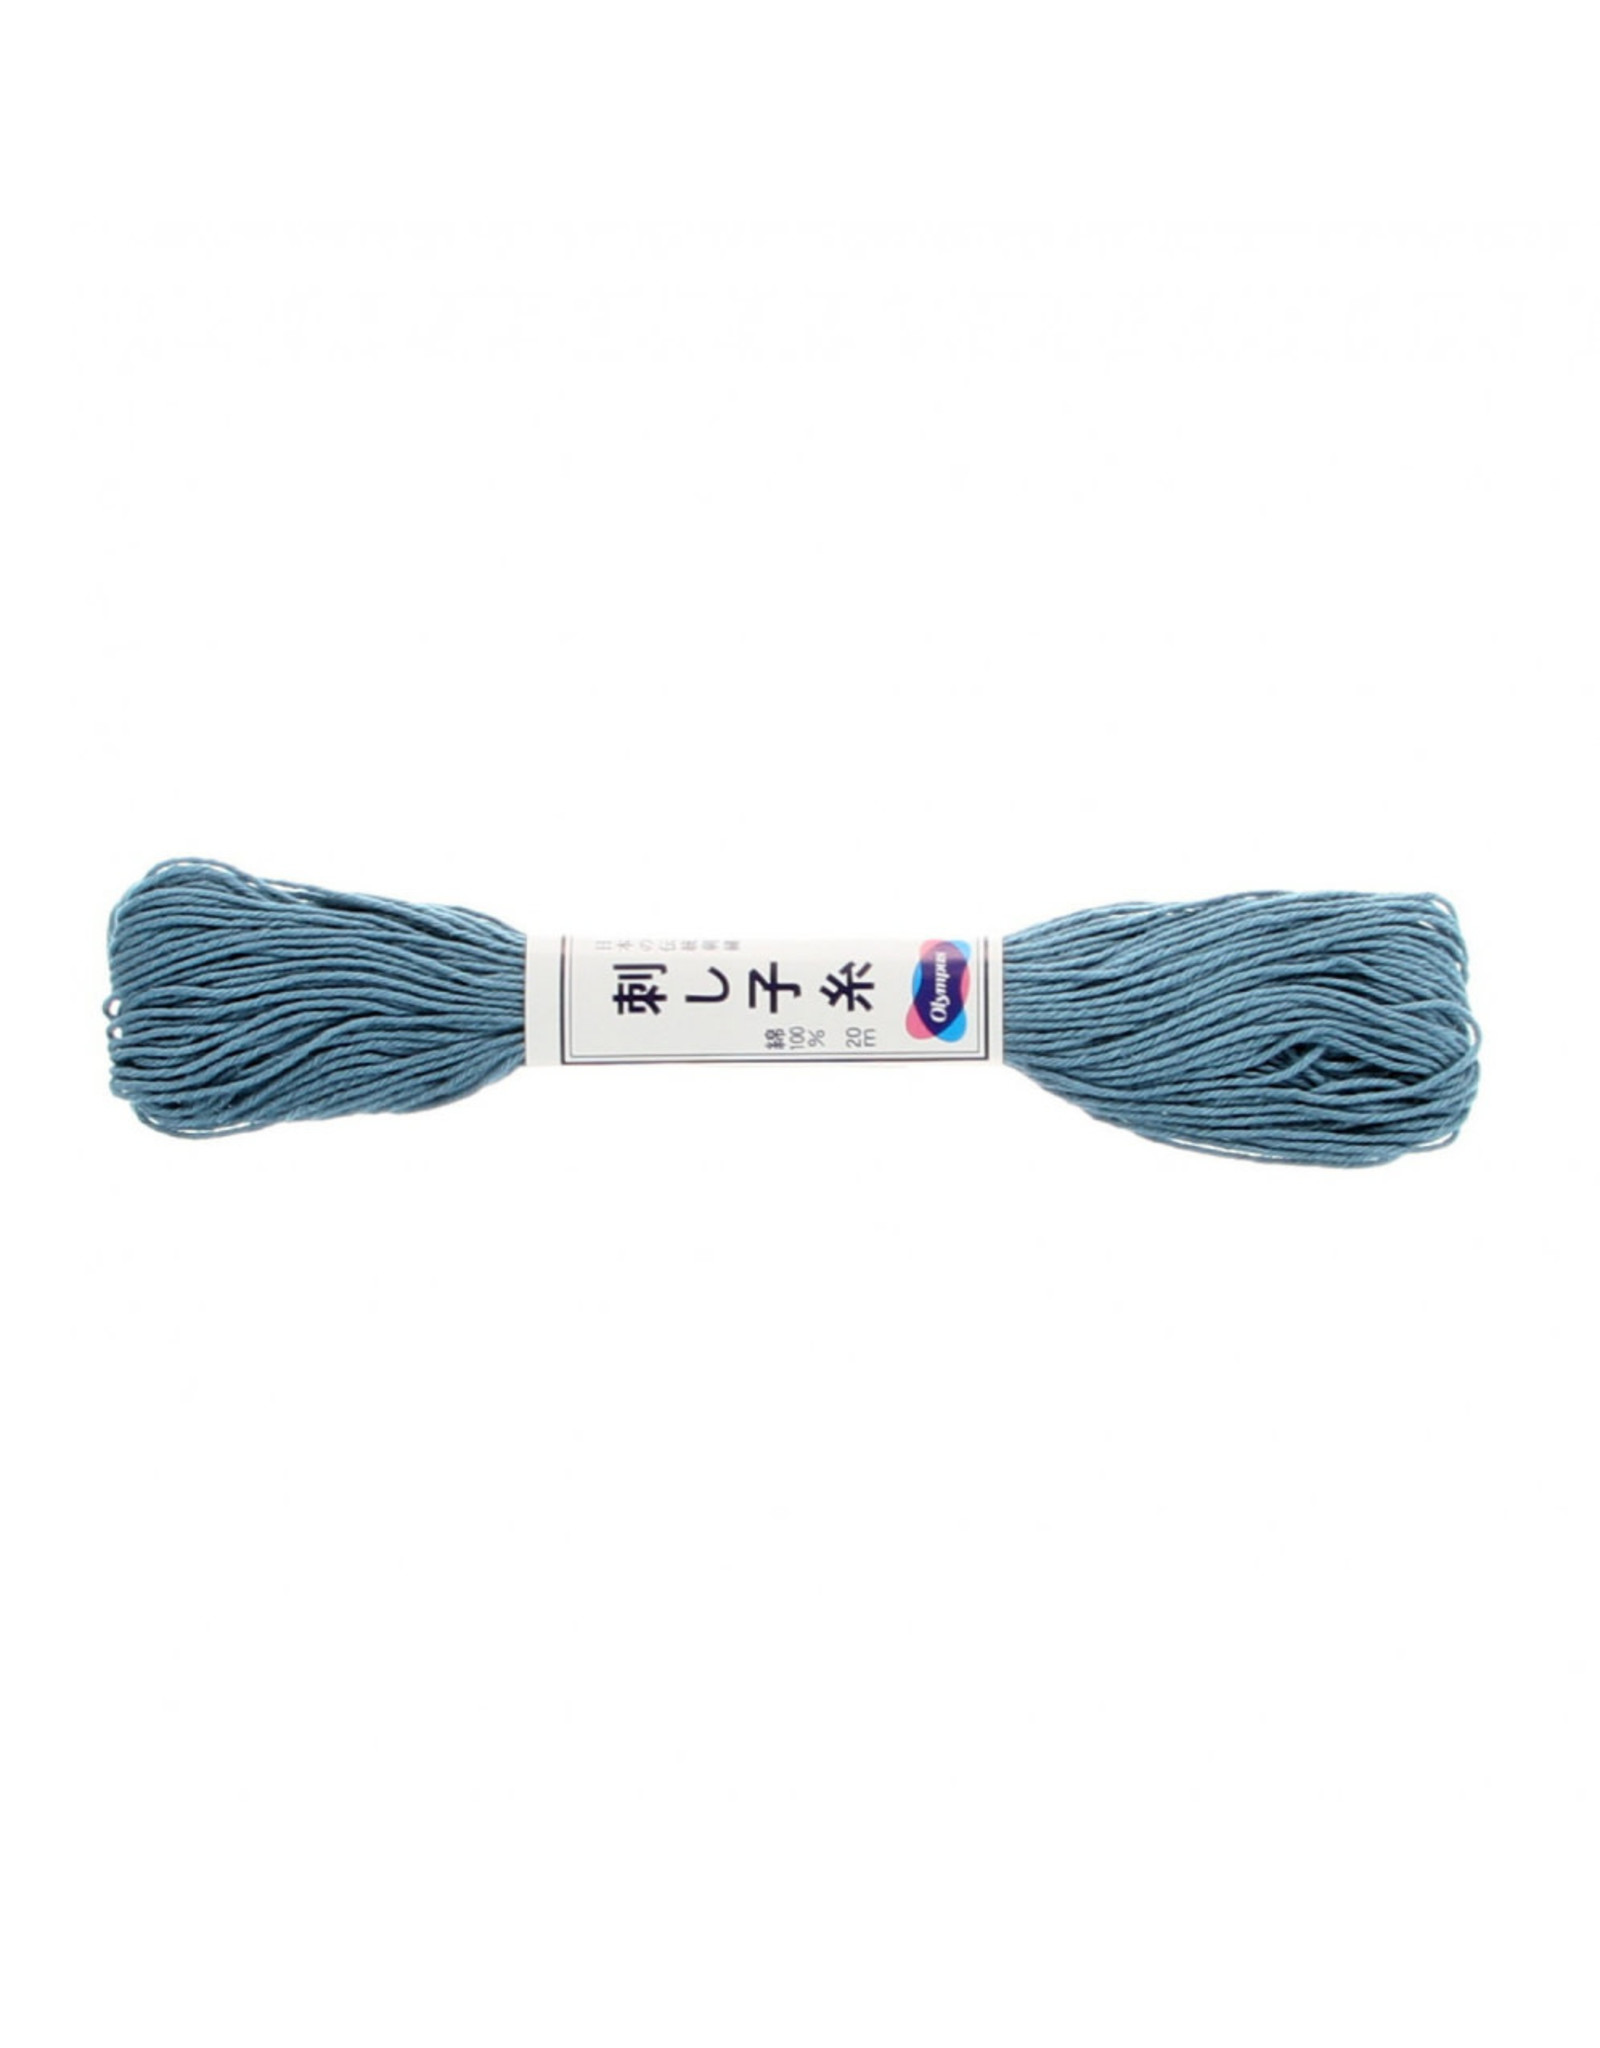 Olympus Sashiko Thread, Sky Blue, 22 yd. skein, 100% Cotton